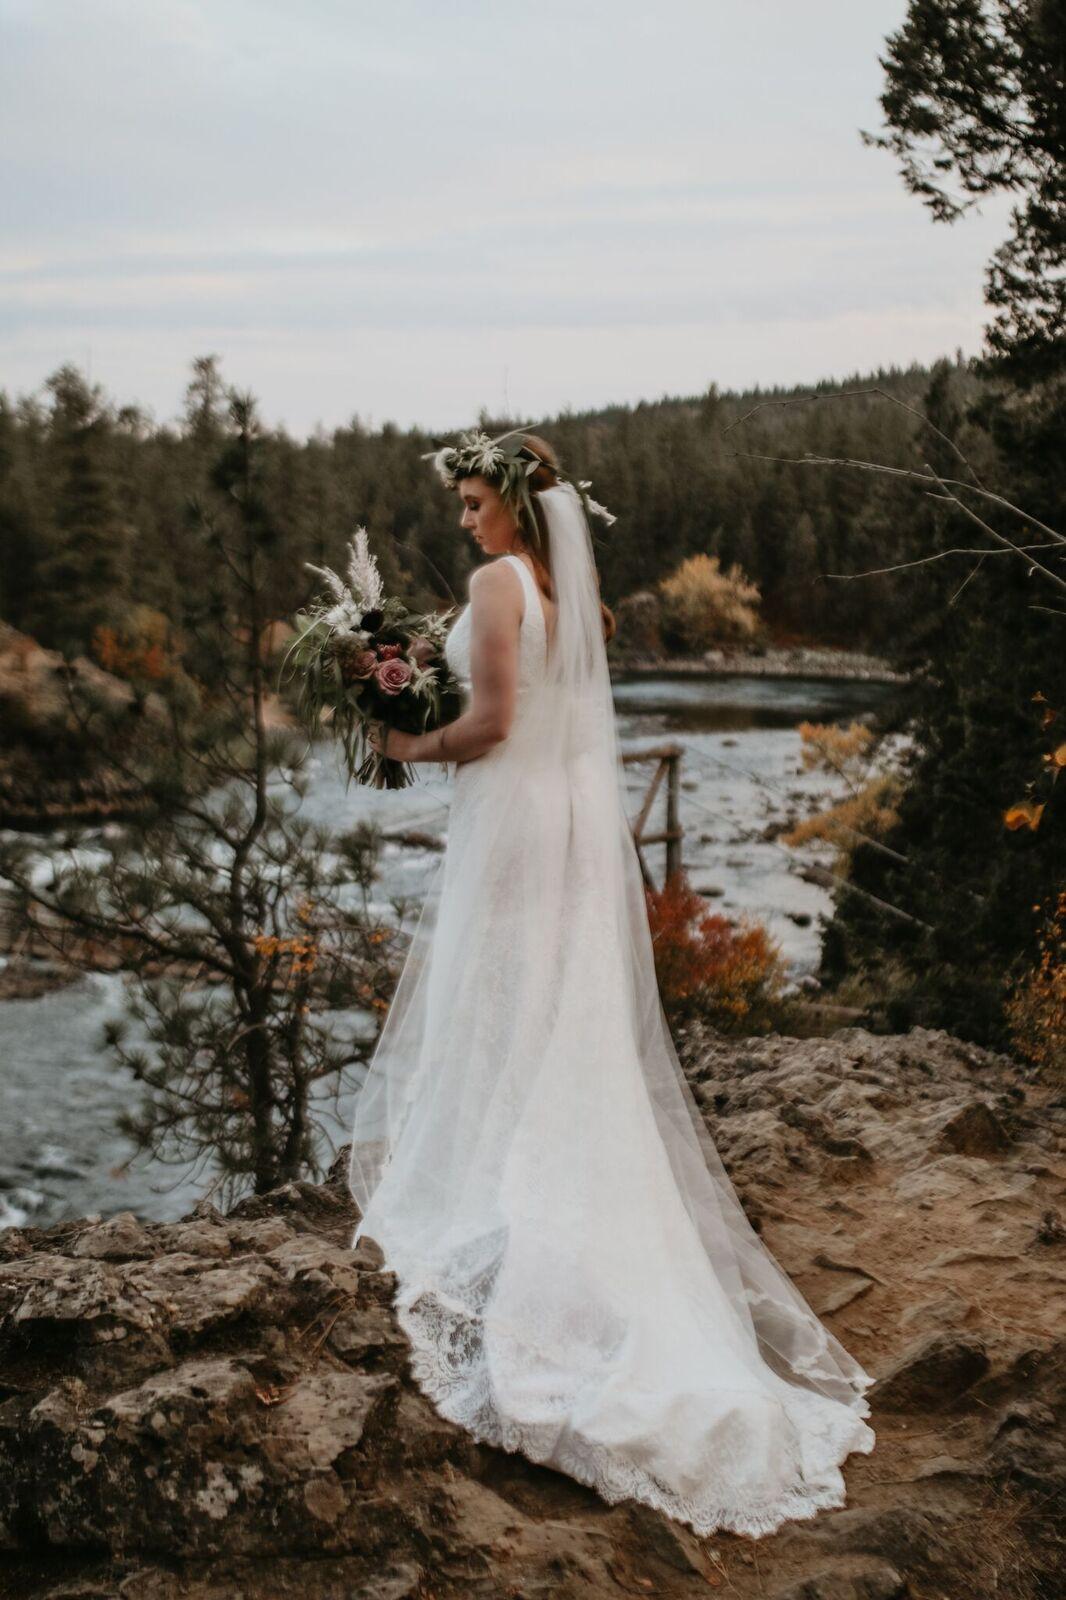 spokane river wedding photo shoot image13